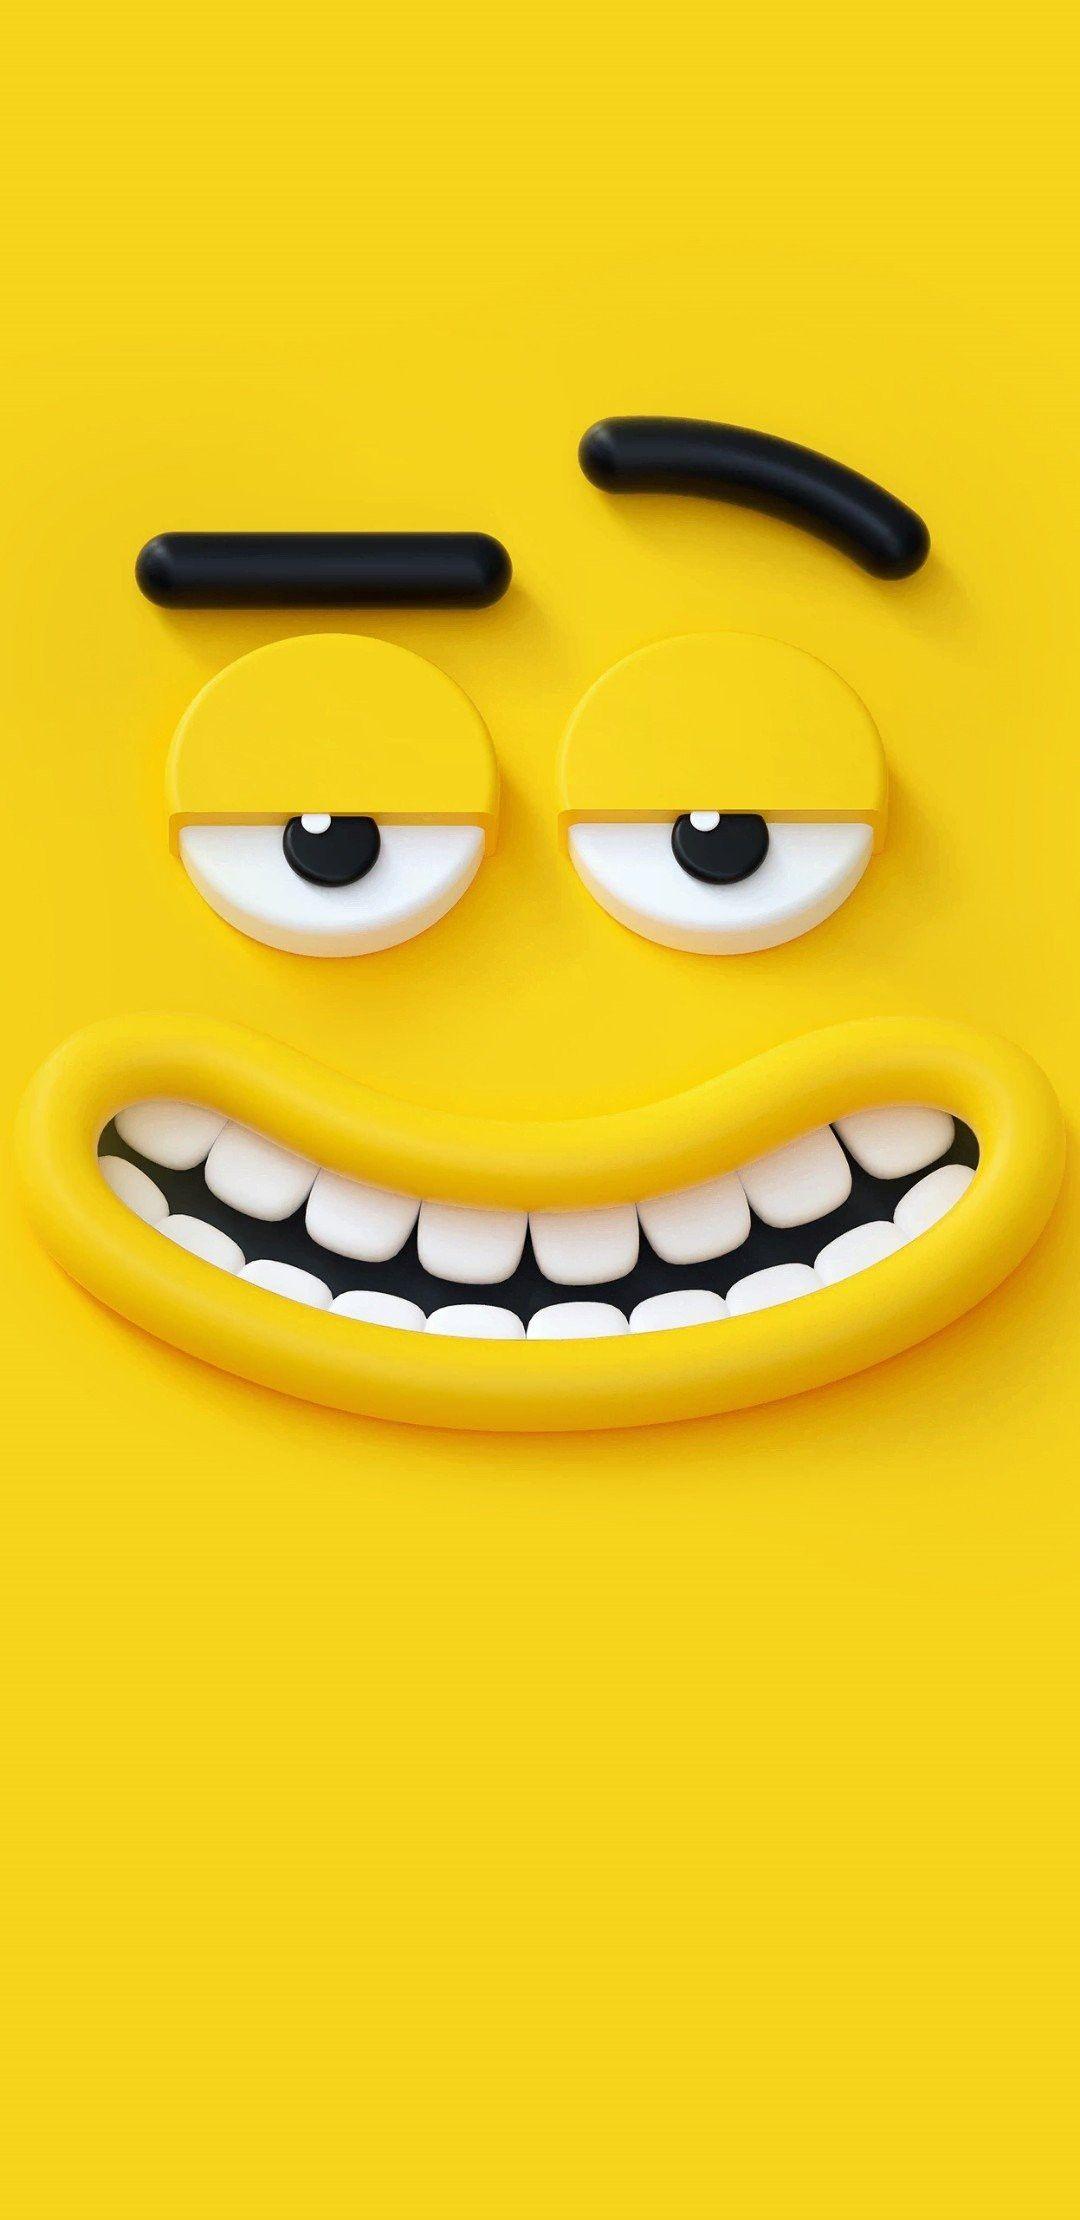 Yellow Cartoon Wallpaper Emoji Wallpaper Cartoon Wallpaper Hd